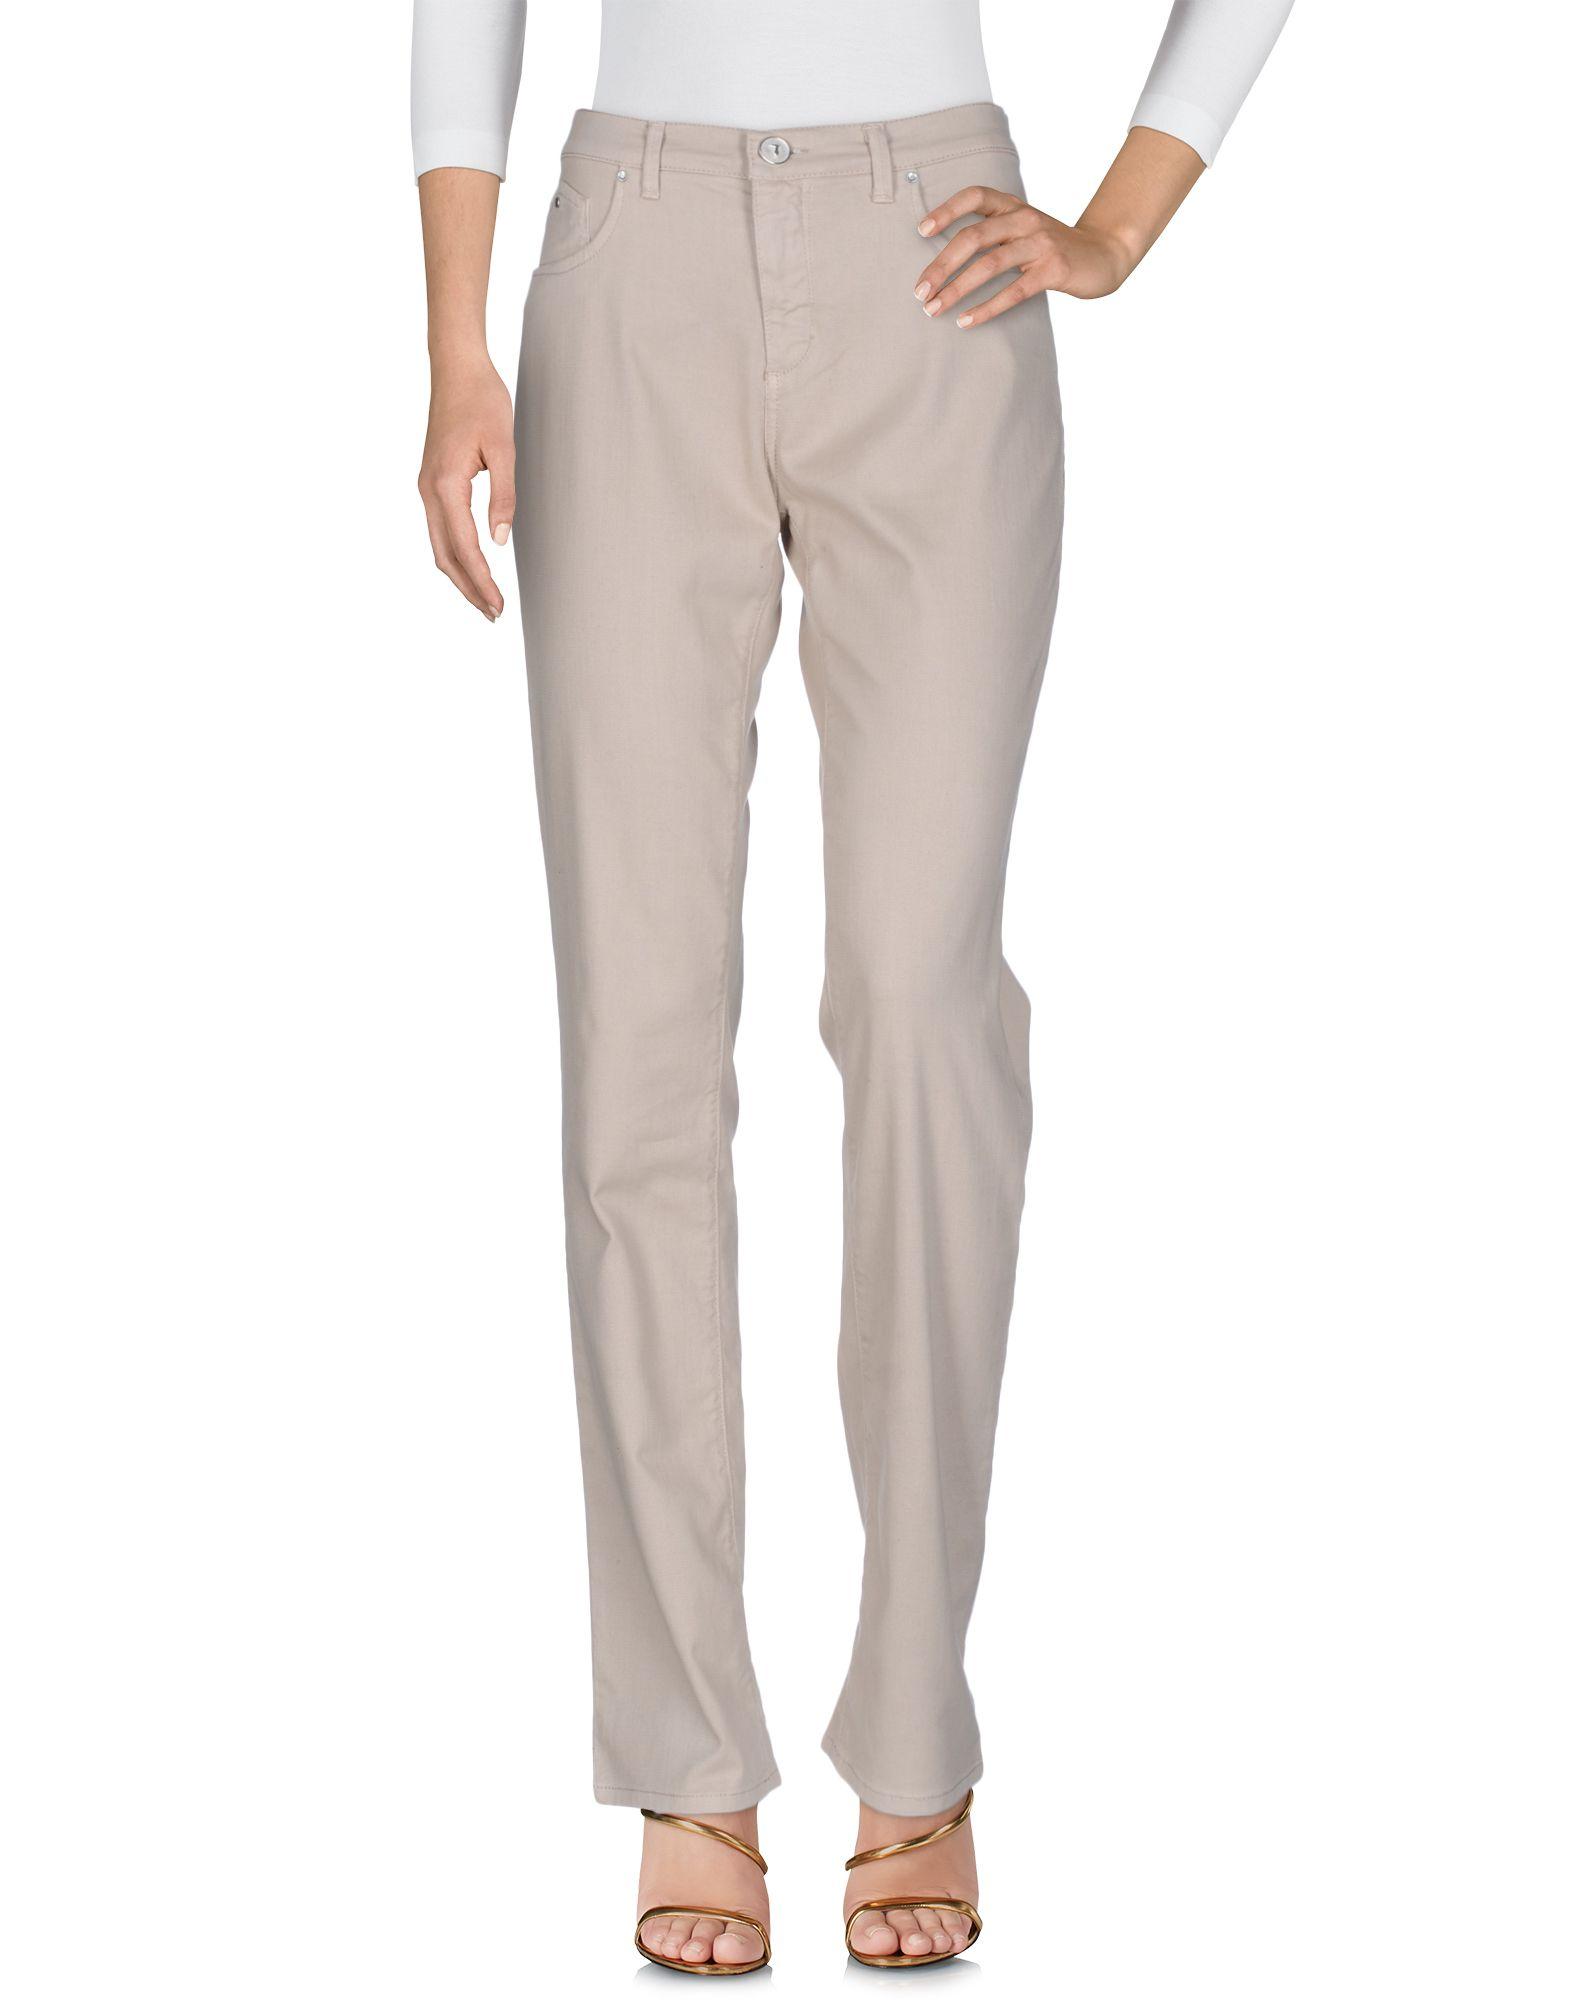 Pantaloni Jeans Jeans Trussardi Jeans donna - 42608390FI